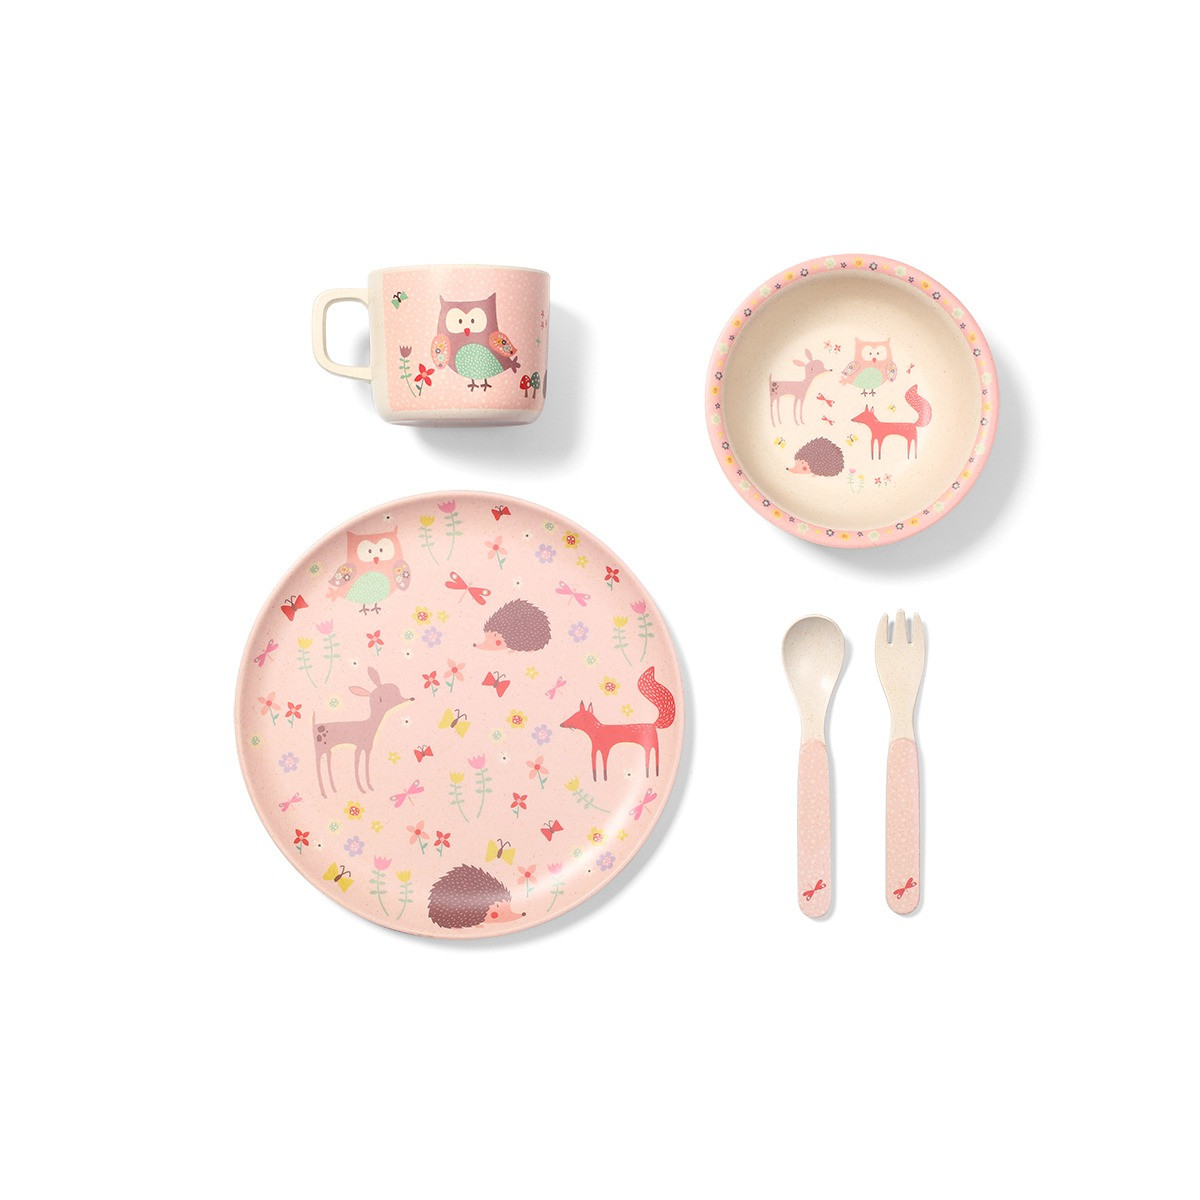 Бамбуковая посуда для детей FOREST GREEN Babyono